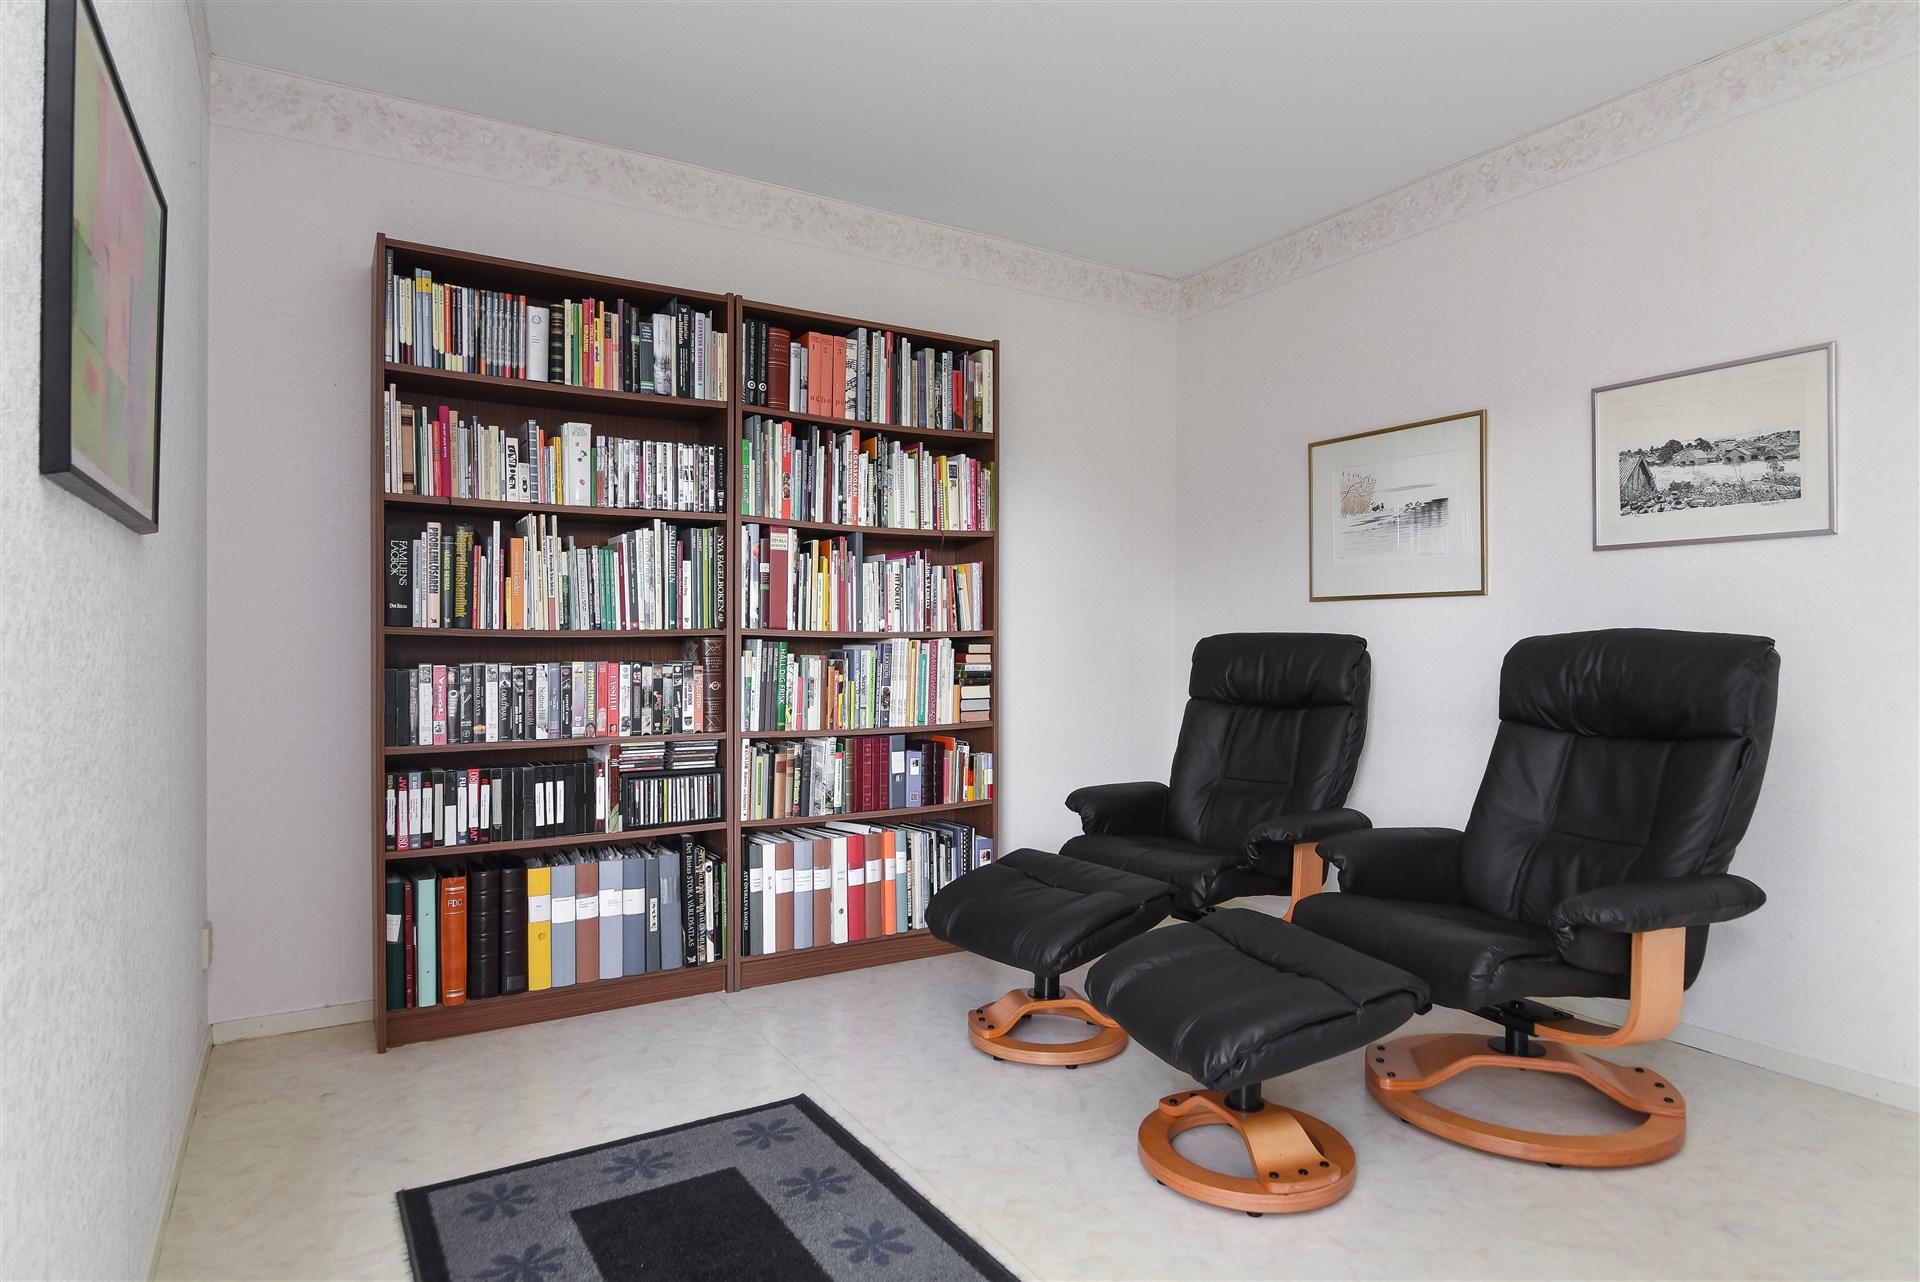 Sovrum / bibliotek